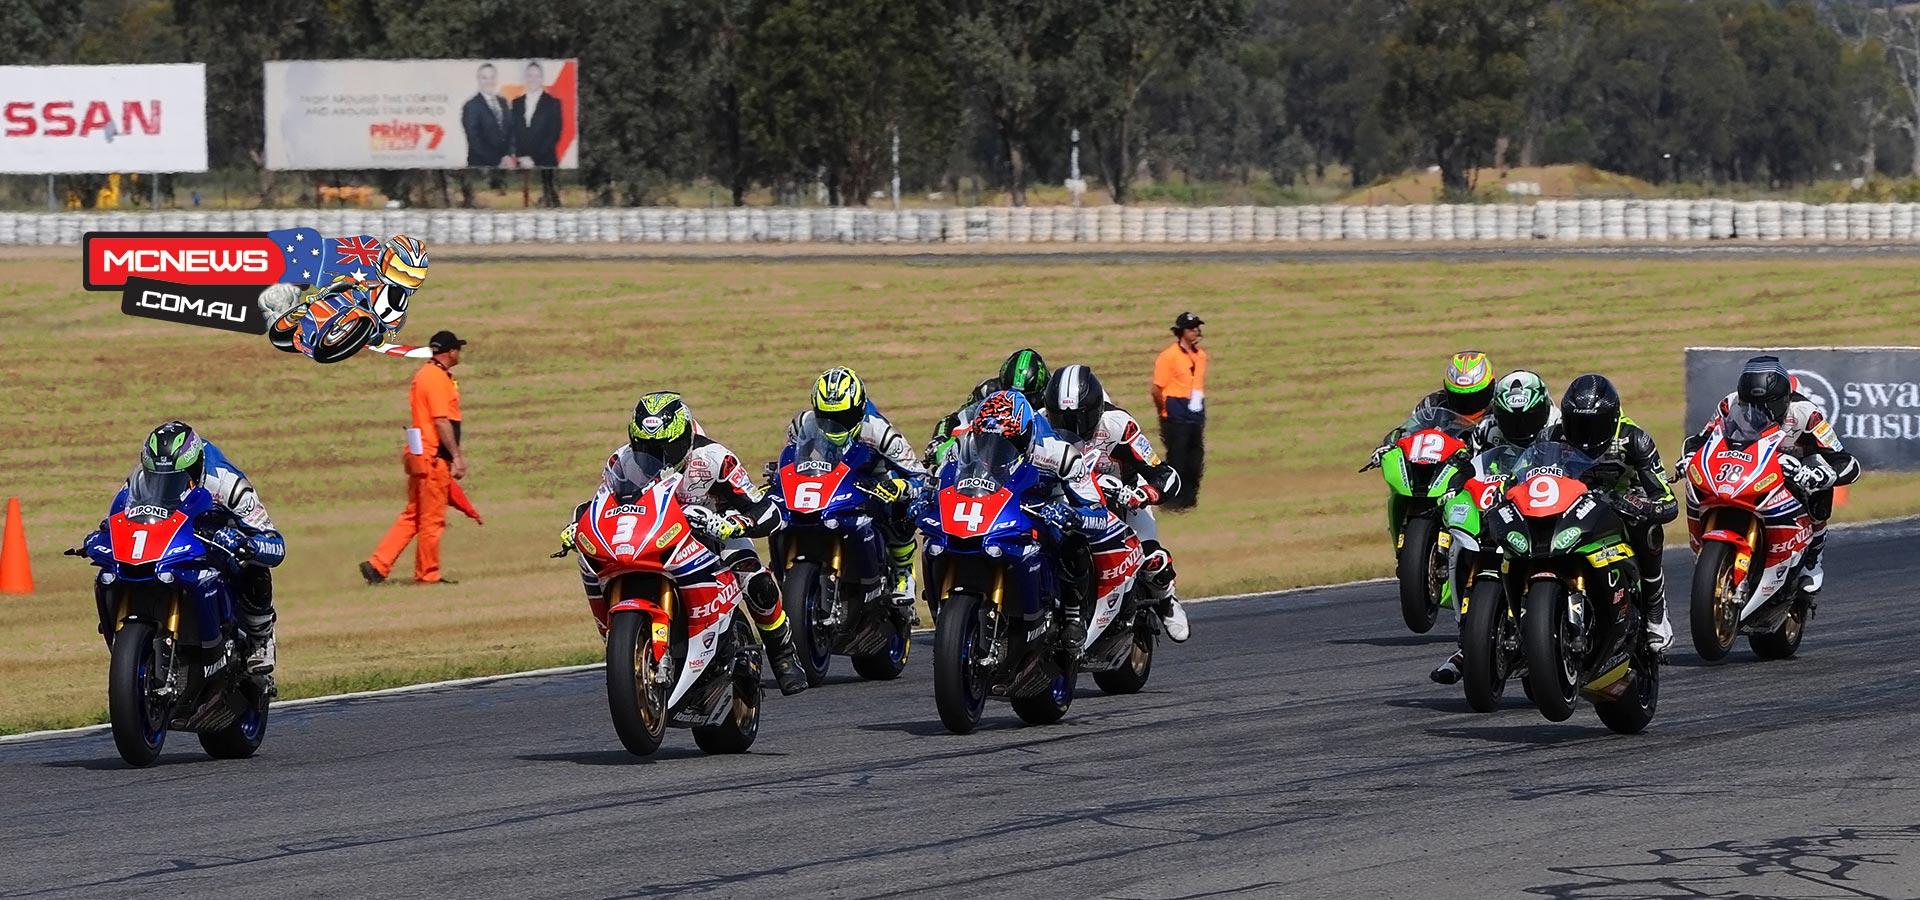 Swann Australasian FX Superbike Championship 2015 - Round Six - Winton Motor Raceway - Superbike Start